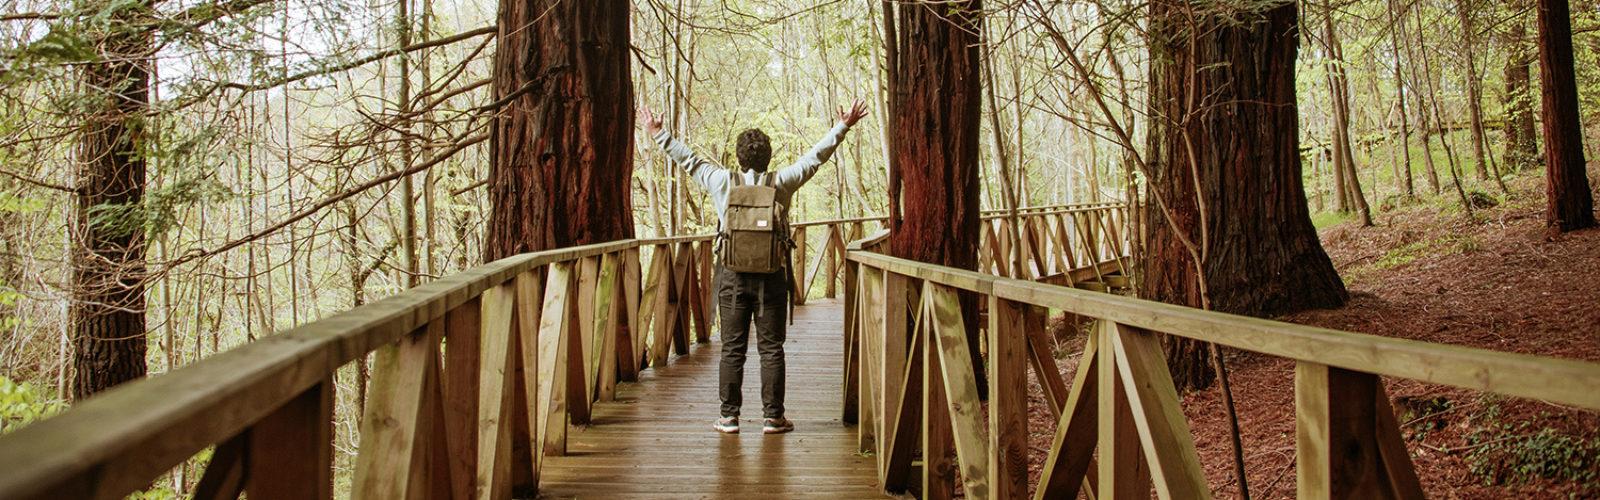 Visit California National Parks Fleetwood RV